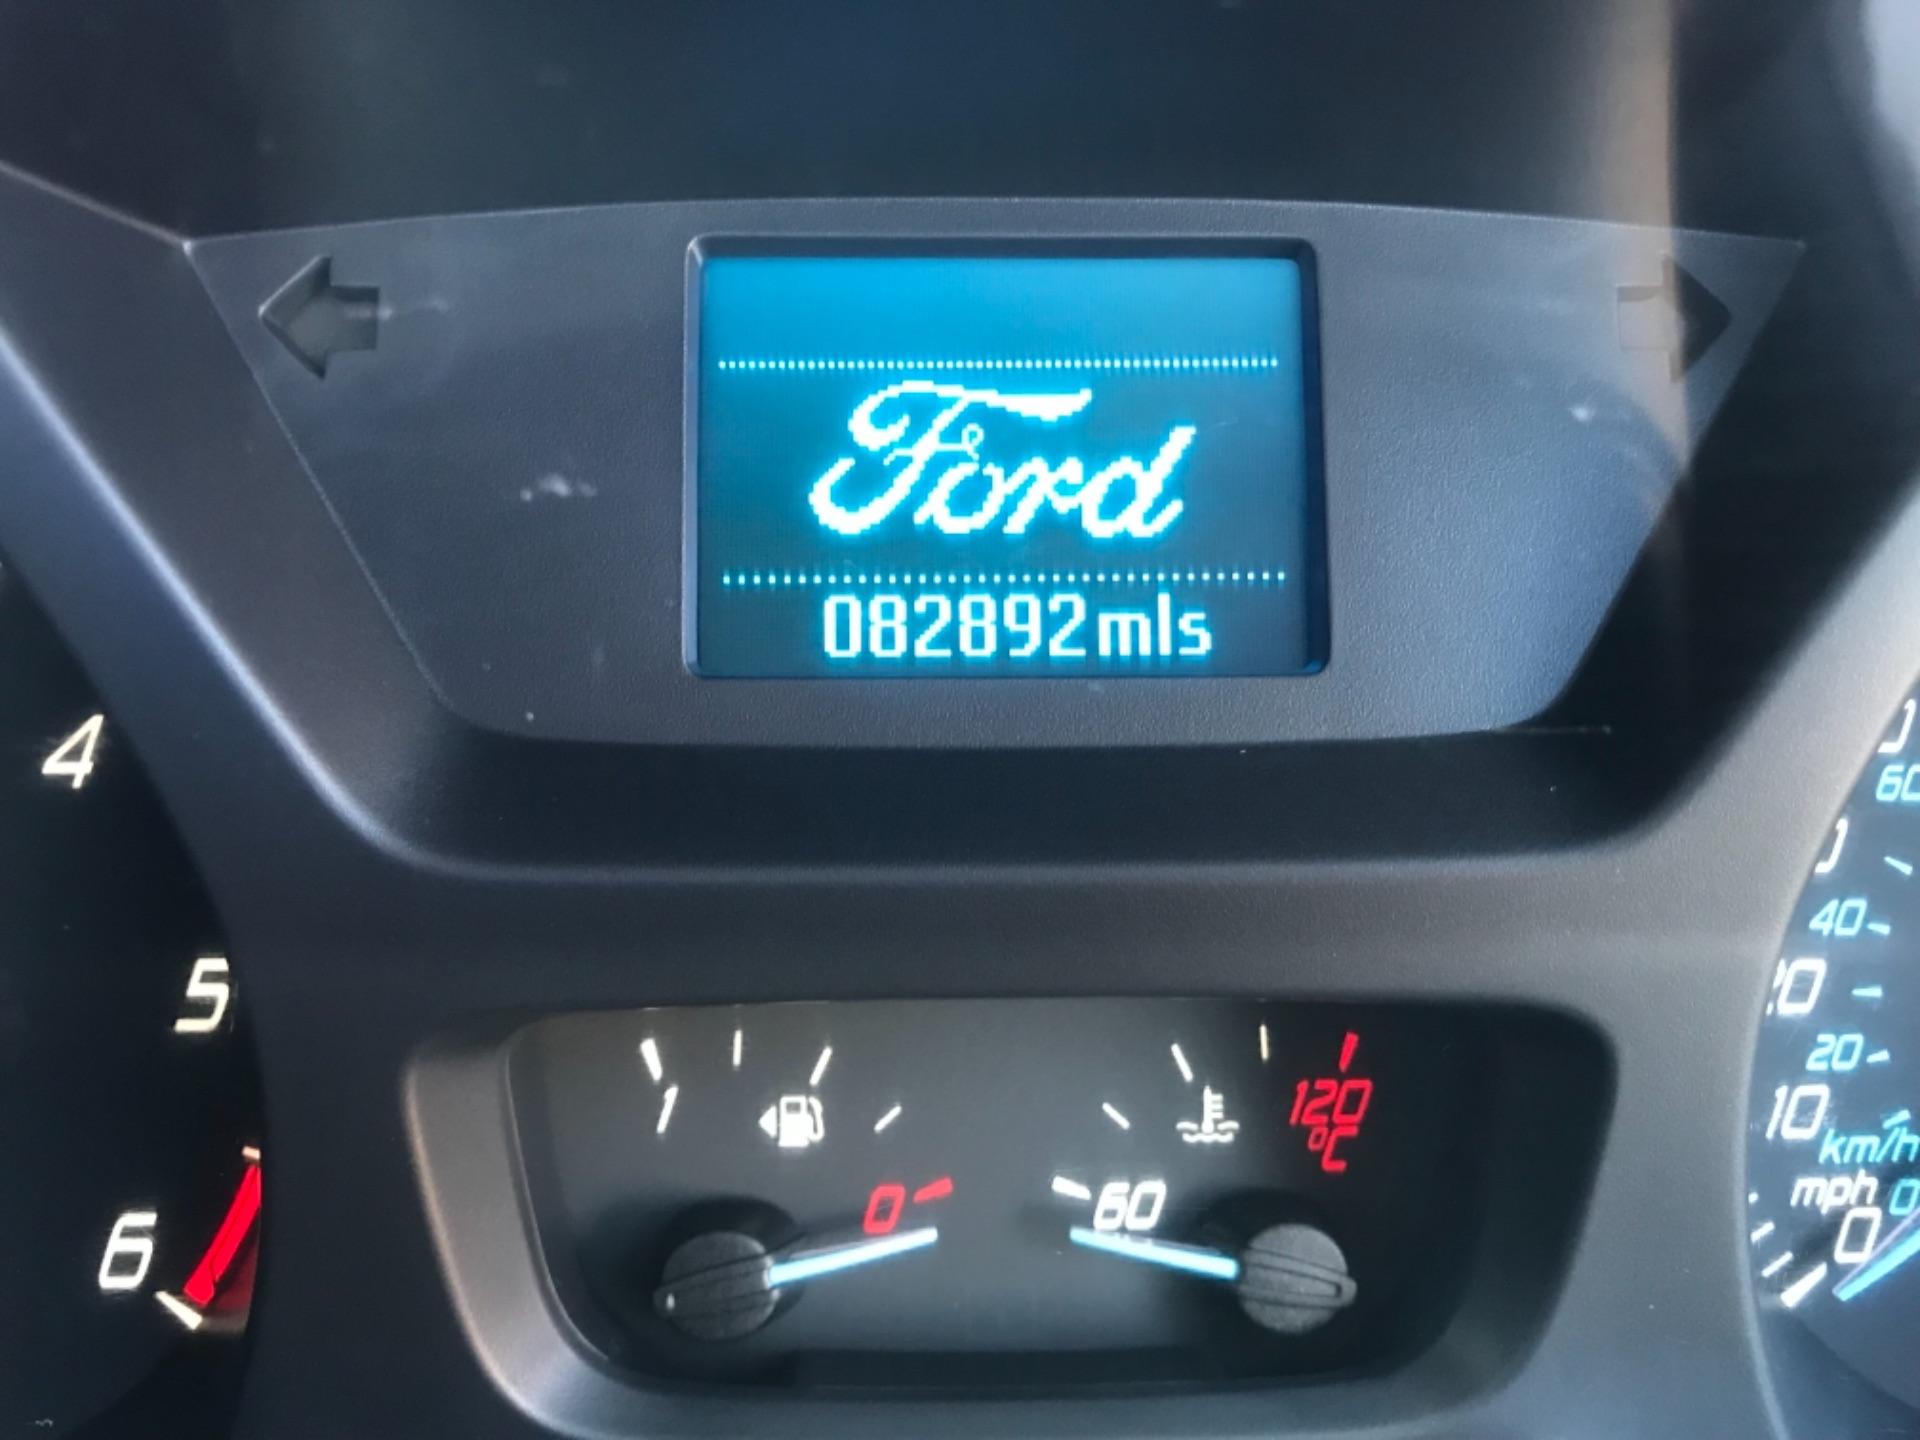 2016 Ford Transit 2.2 Tdci 125Ps Dropside DRW Tail lift (YS66SNU) Image 12